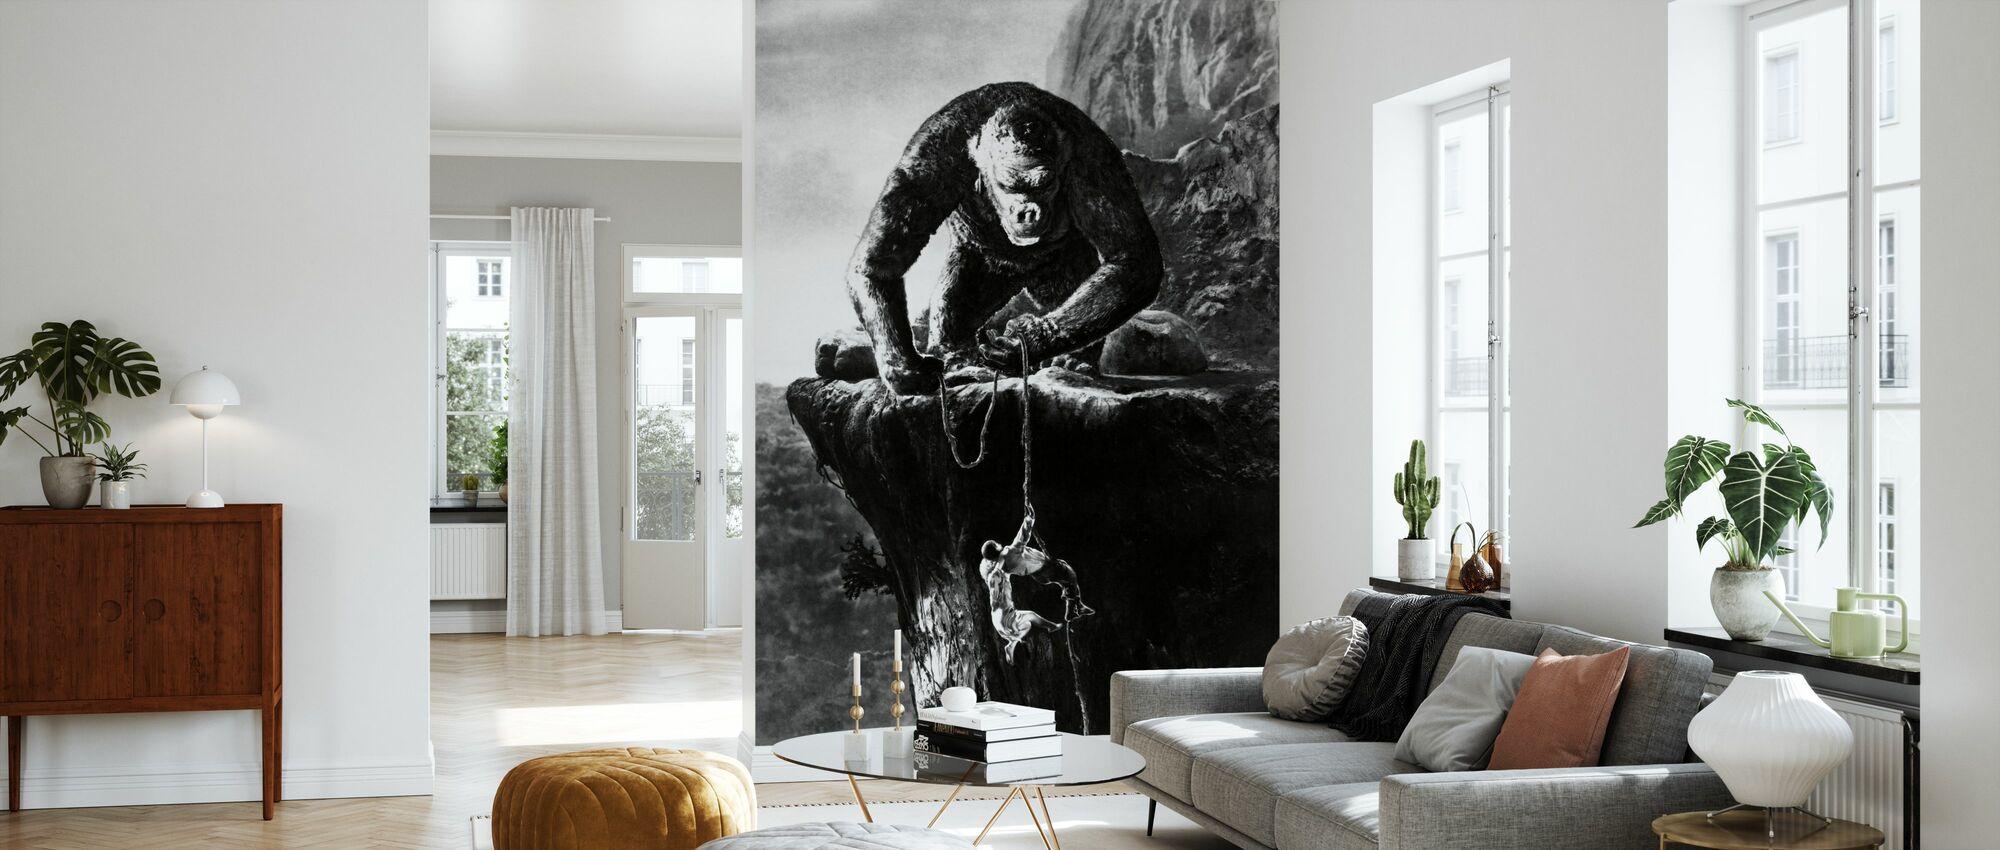 King Kong - Fay Wray - Wallpaper - Living Room